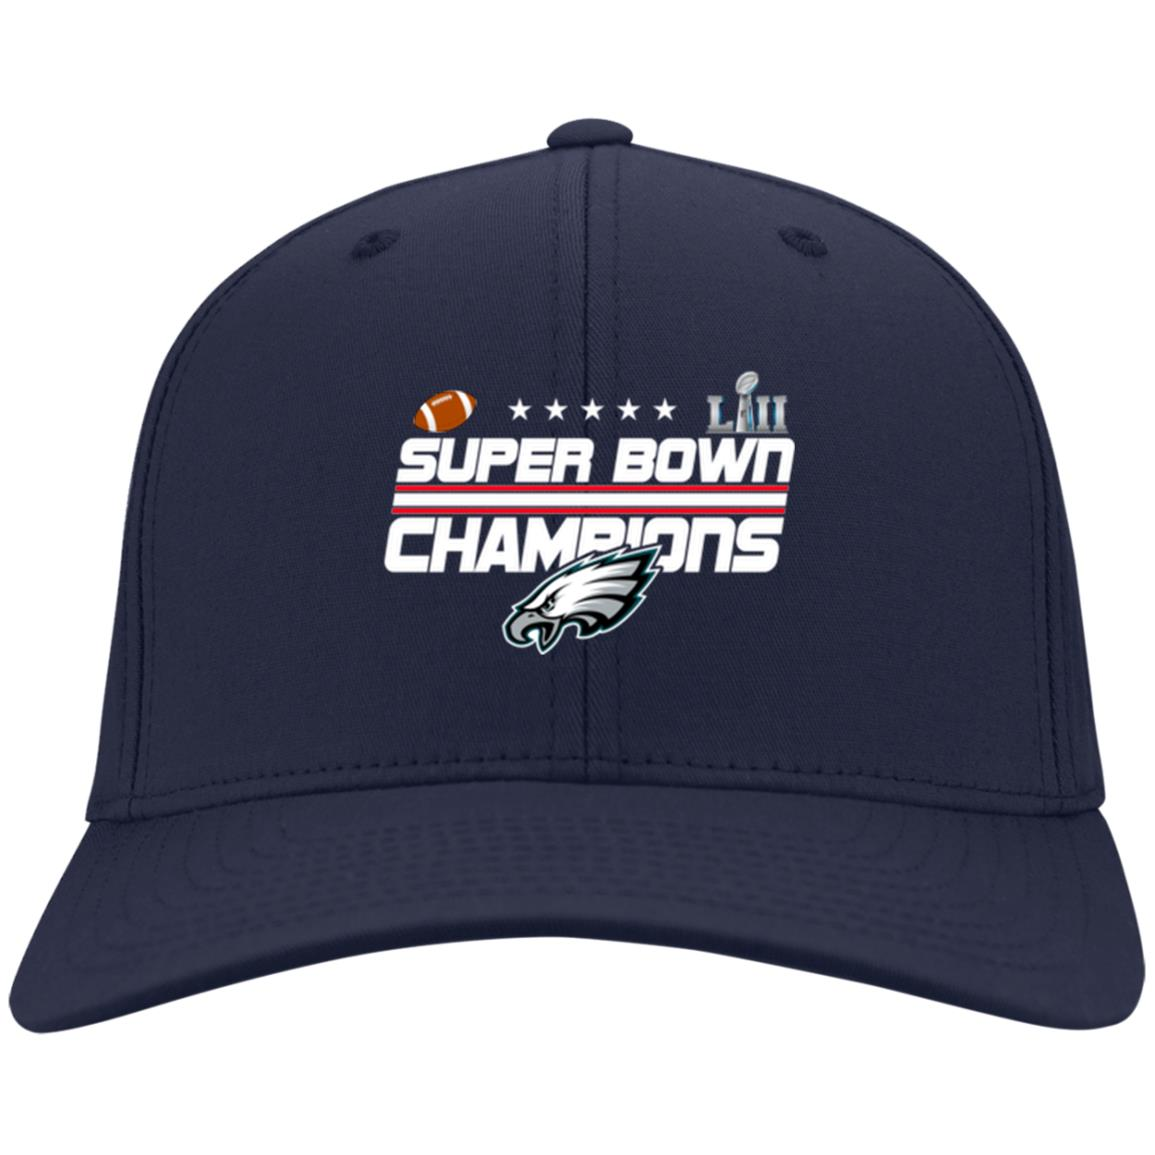 image 257 - Eagles Super Bowl Champions Hats